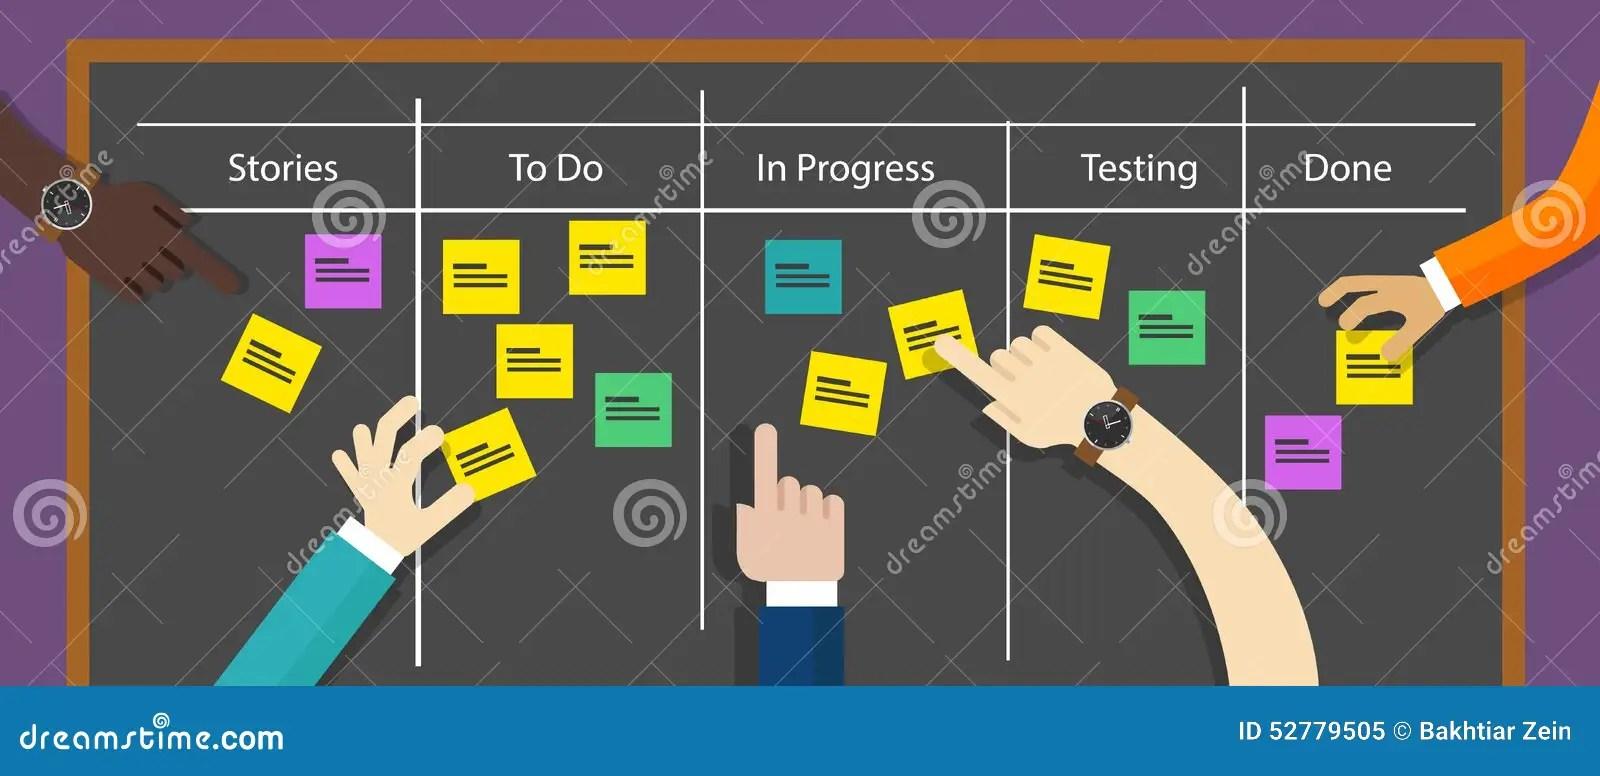 agile process flow diagram neck glands anatomy scrum board methodology software development stock vector - image: 52779505